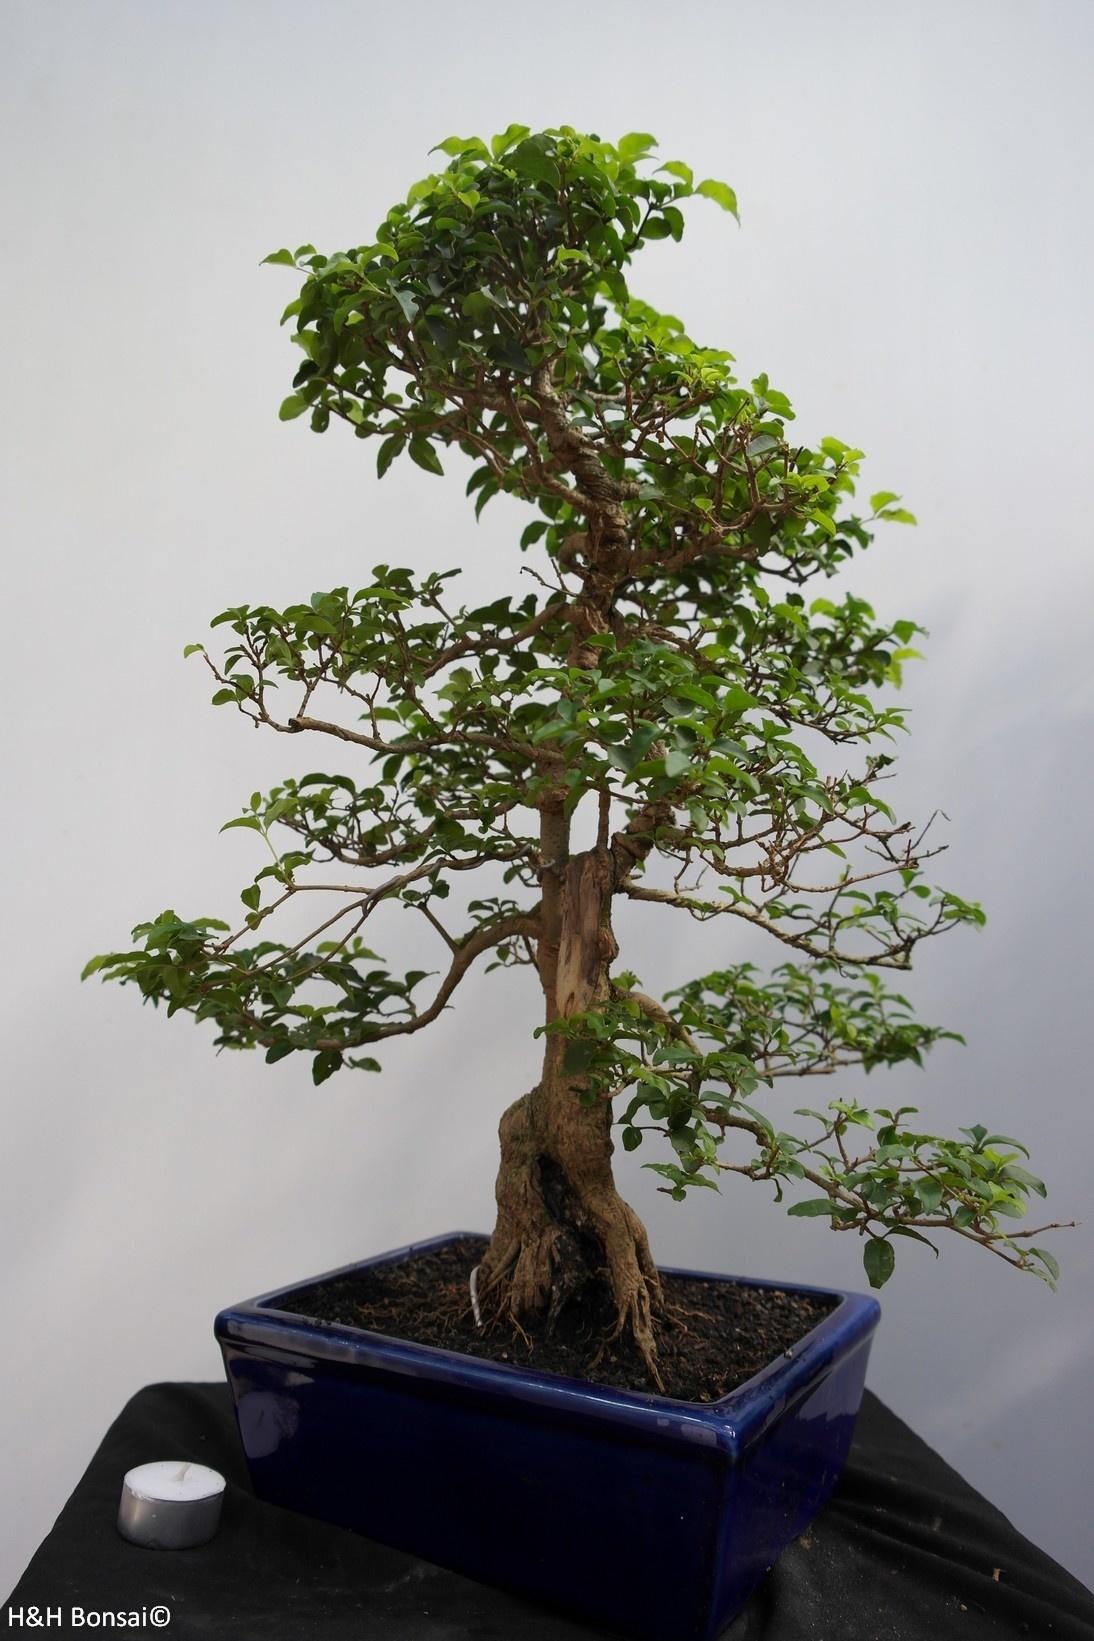 Bonsai Ligustro, Ligustrumsinense, no. 7849